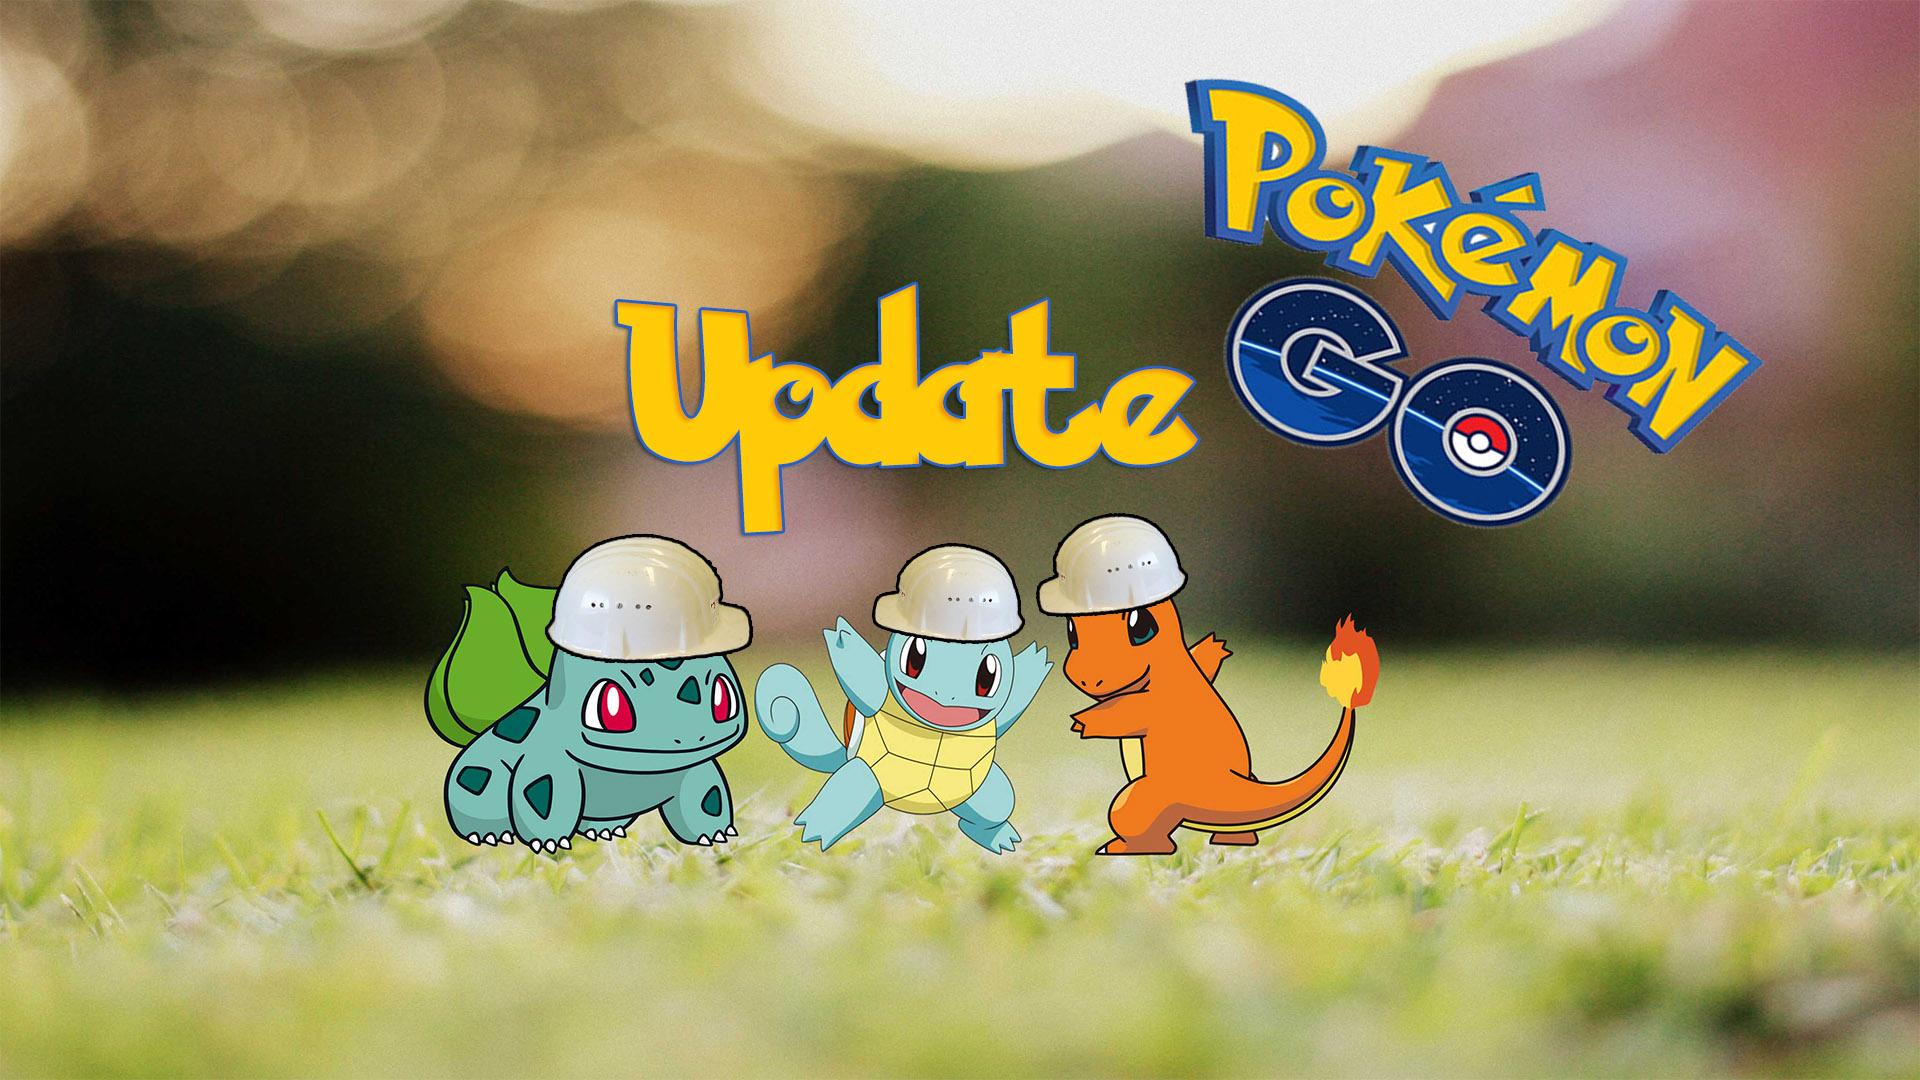 Pokémon GO: Offizieller Trailer - Legendäre Pokémon wie Lugia kommen!